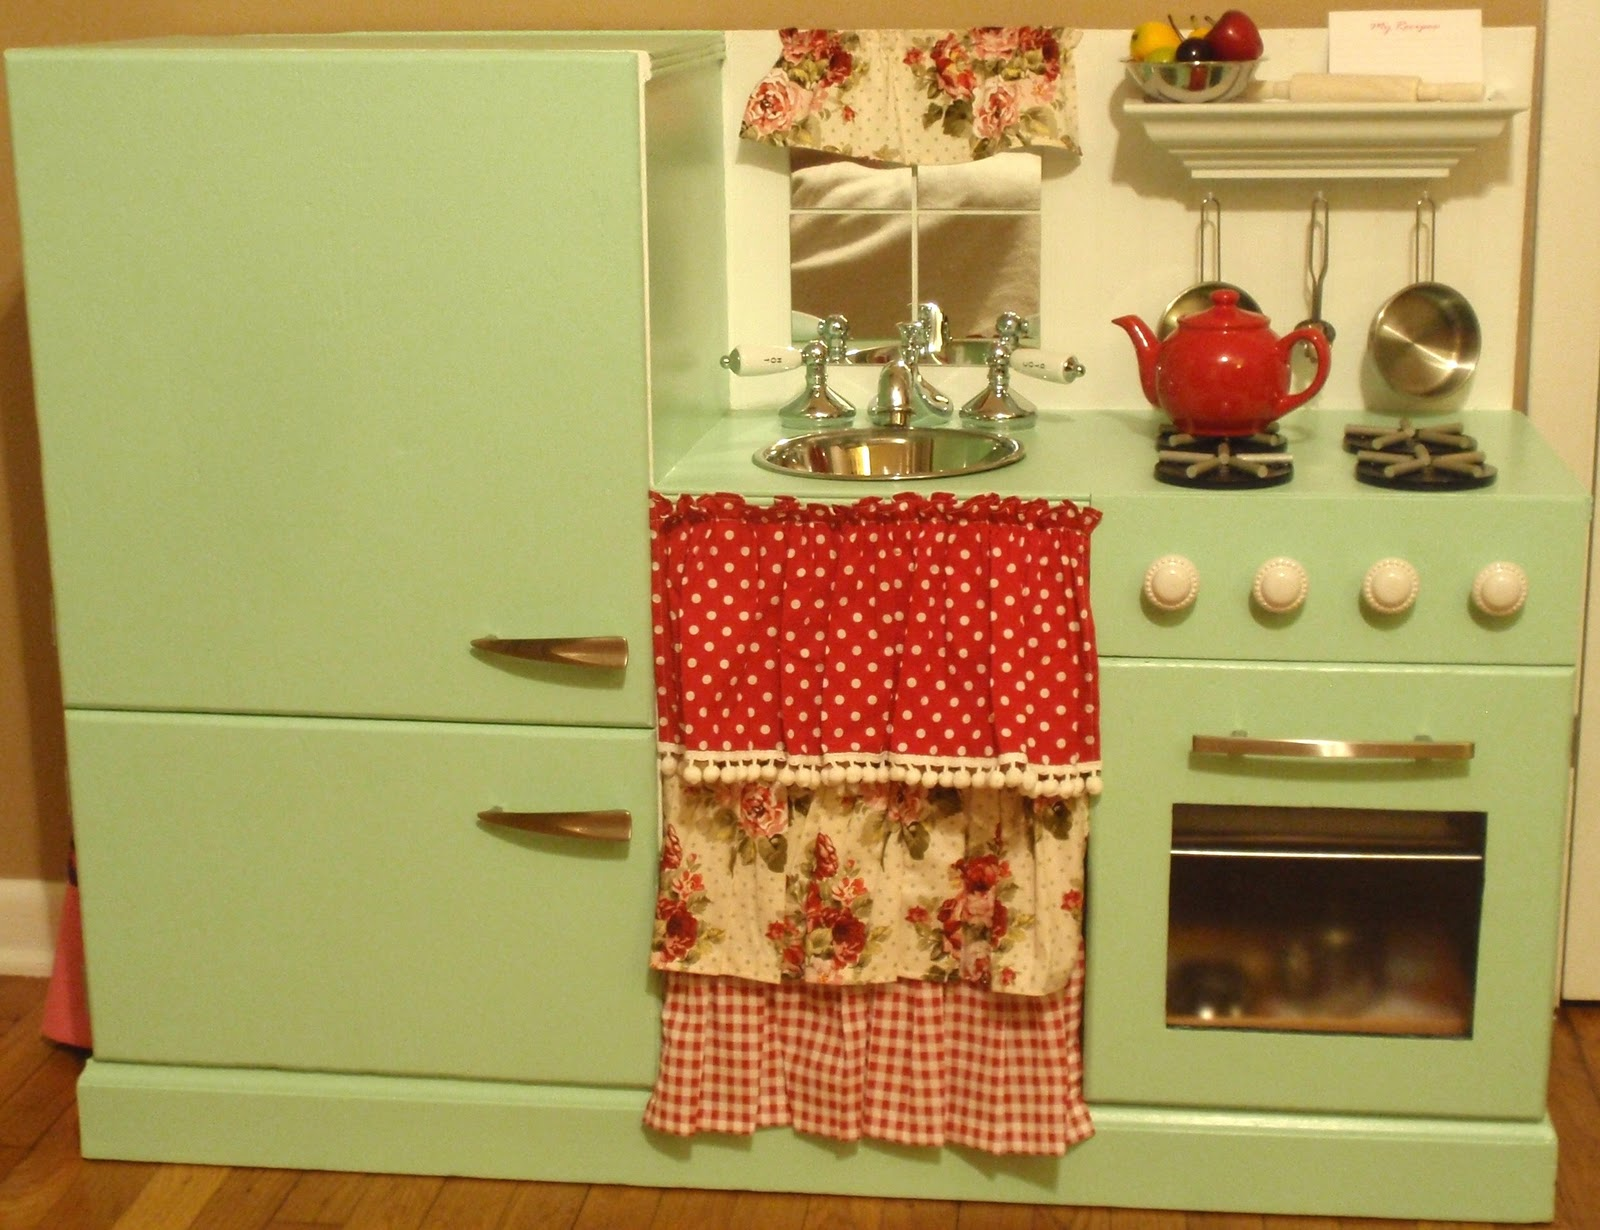 Homemade Play Kitchen Similiar Make A Play Kitchen Keywords